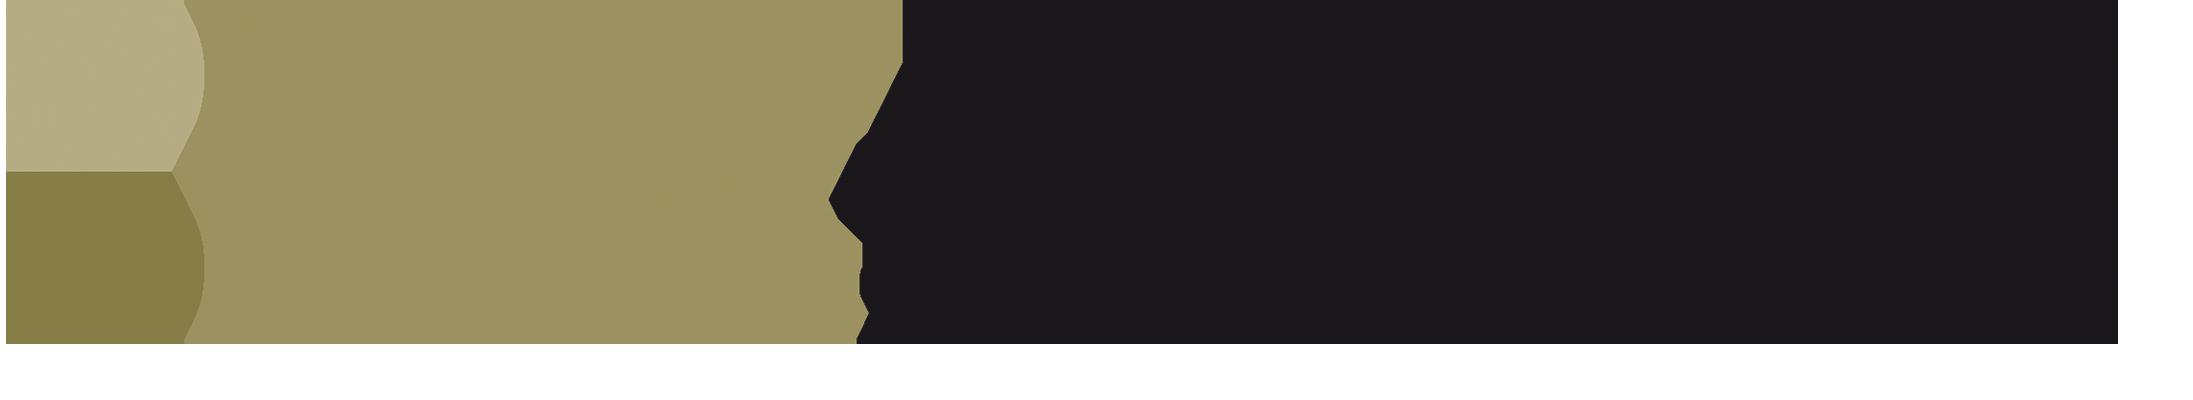 Racketcentrum